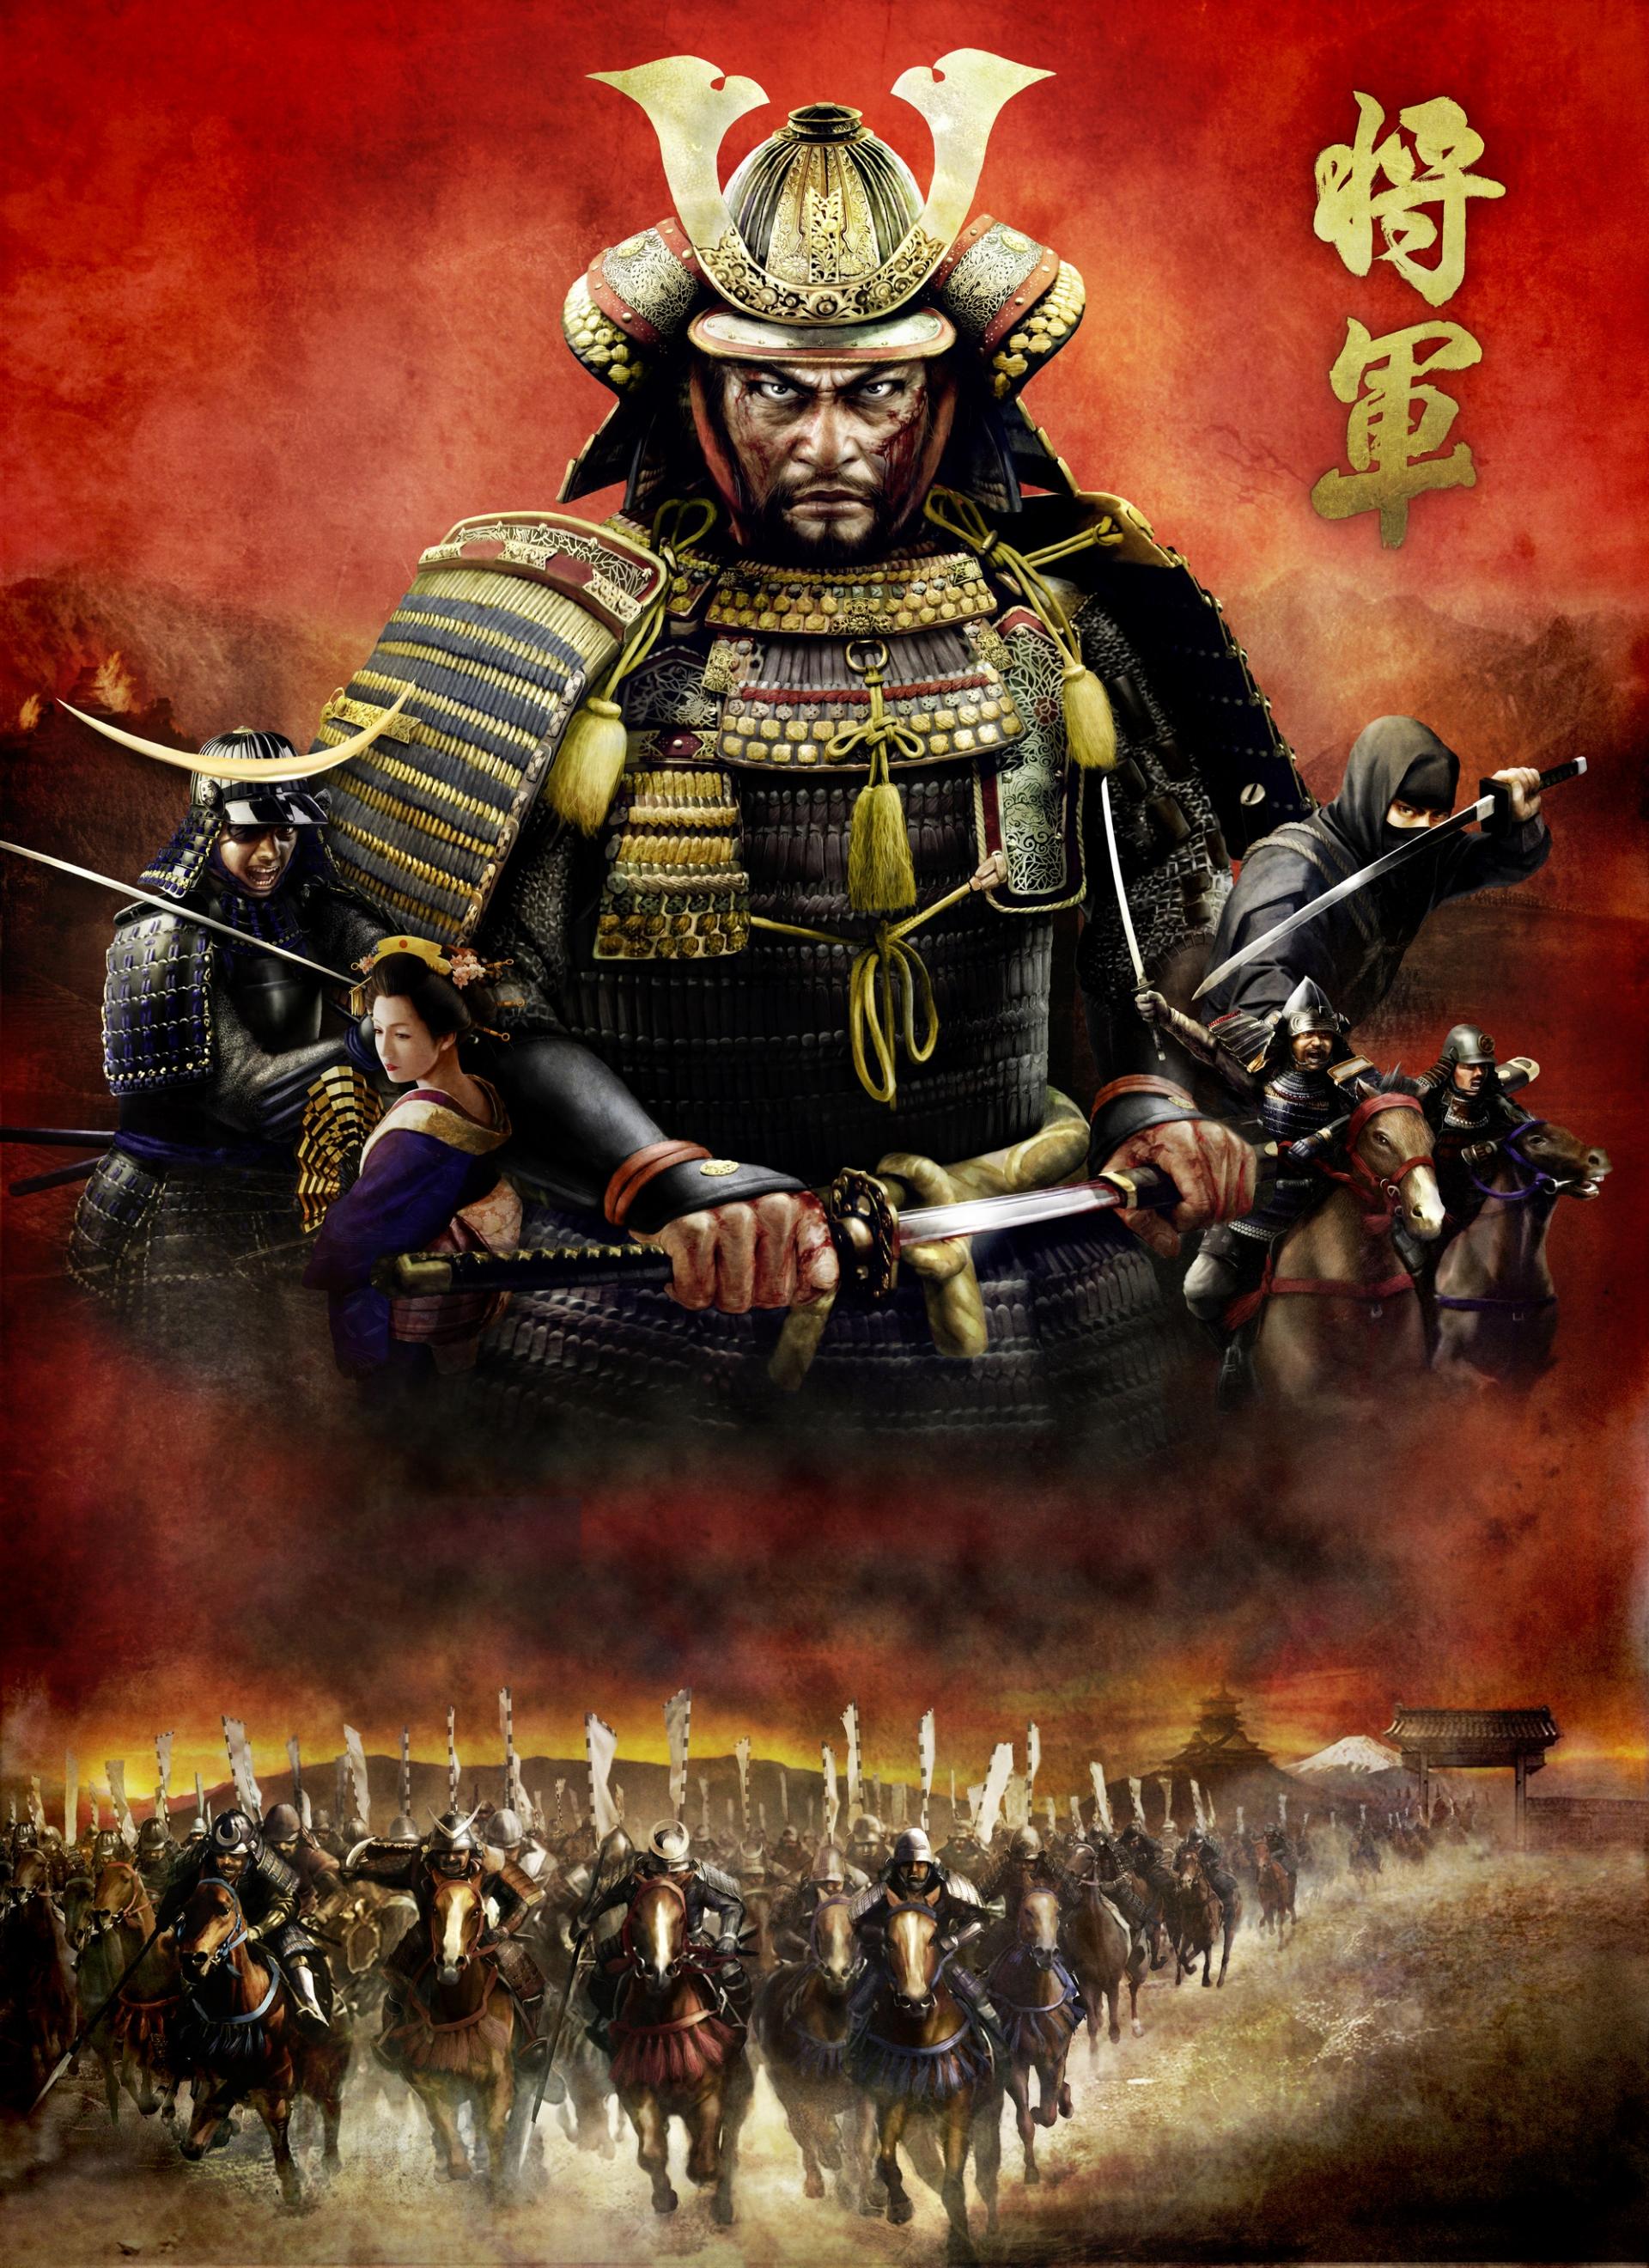 Арт к игре Total War: Shogun 2